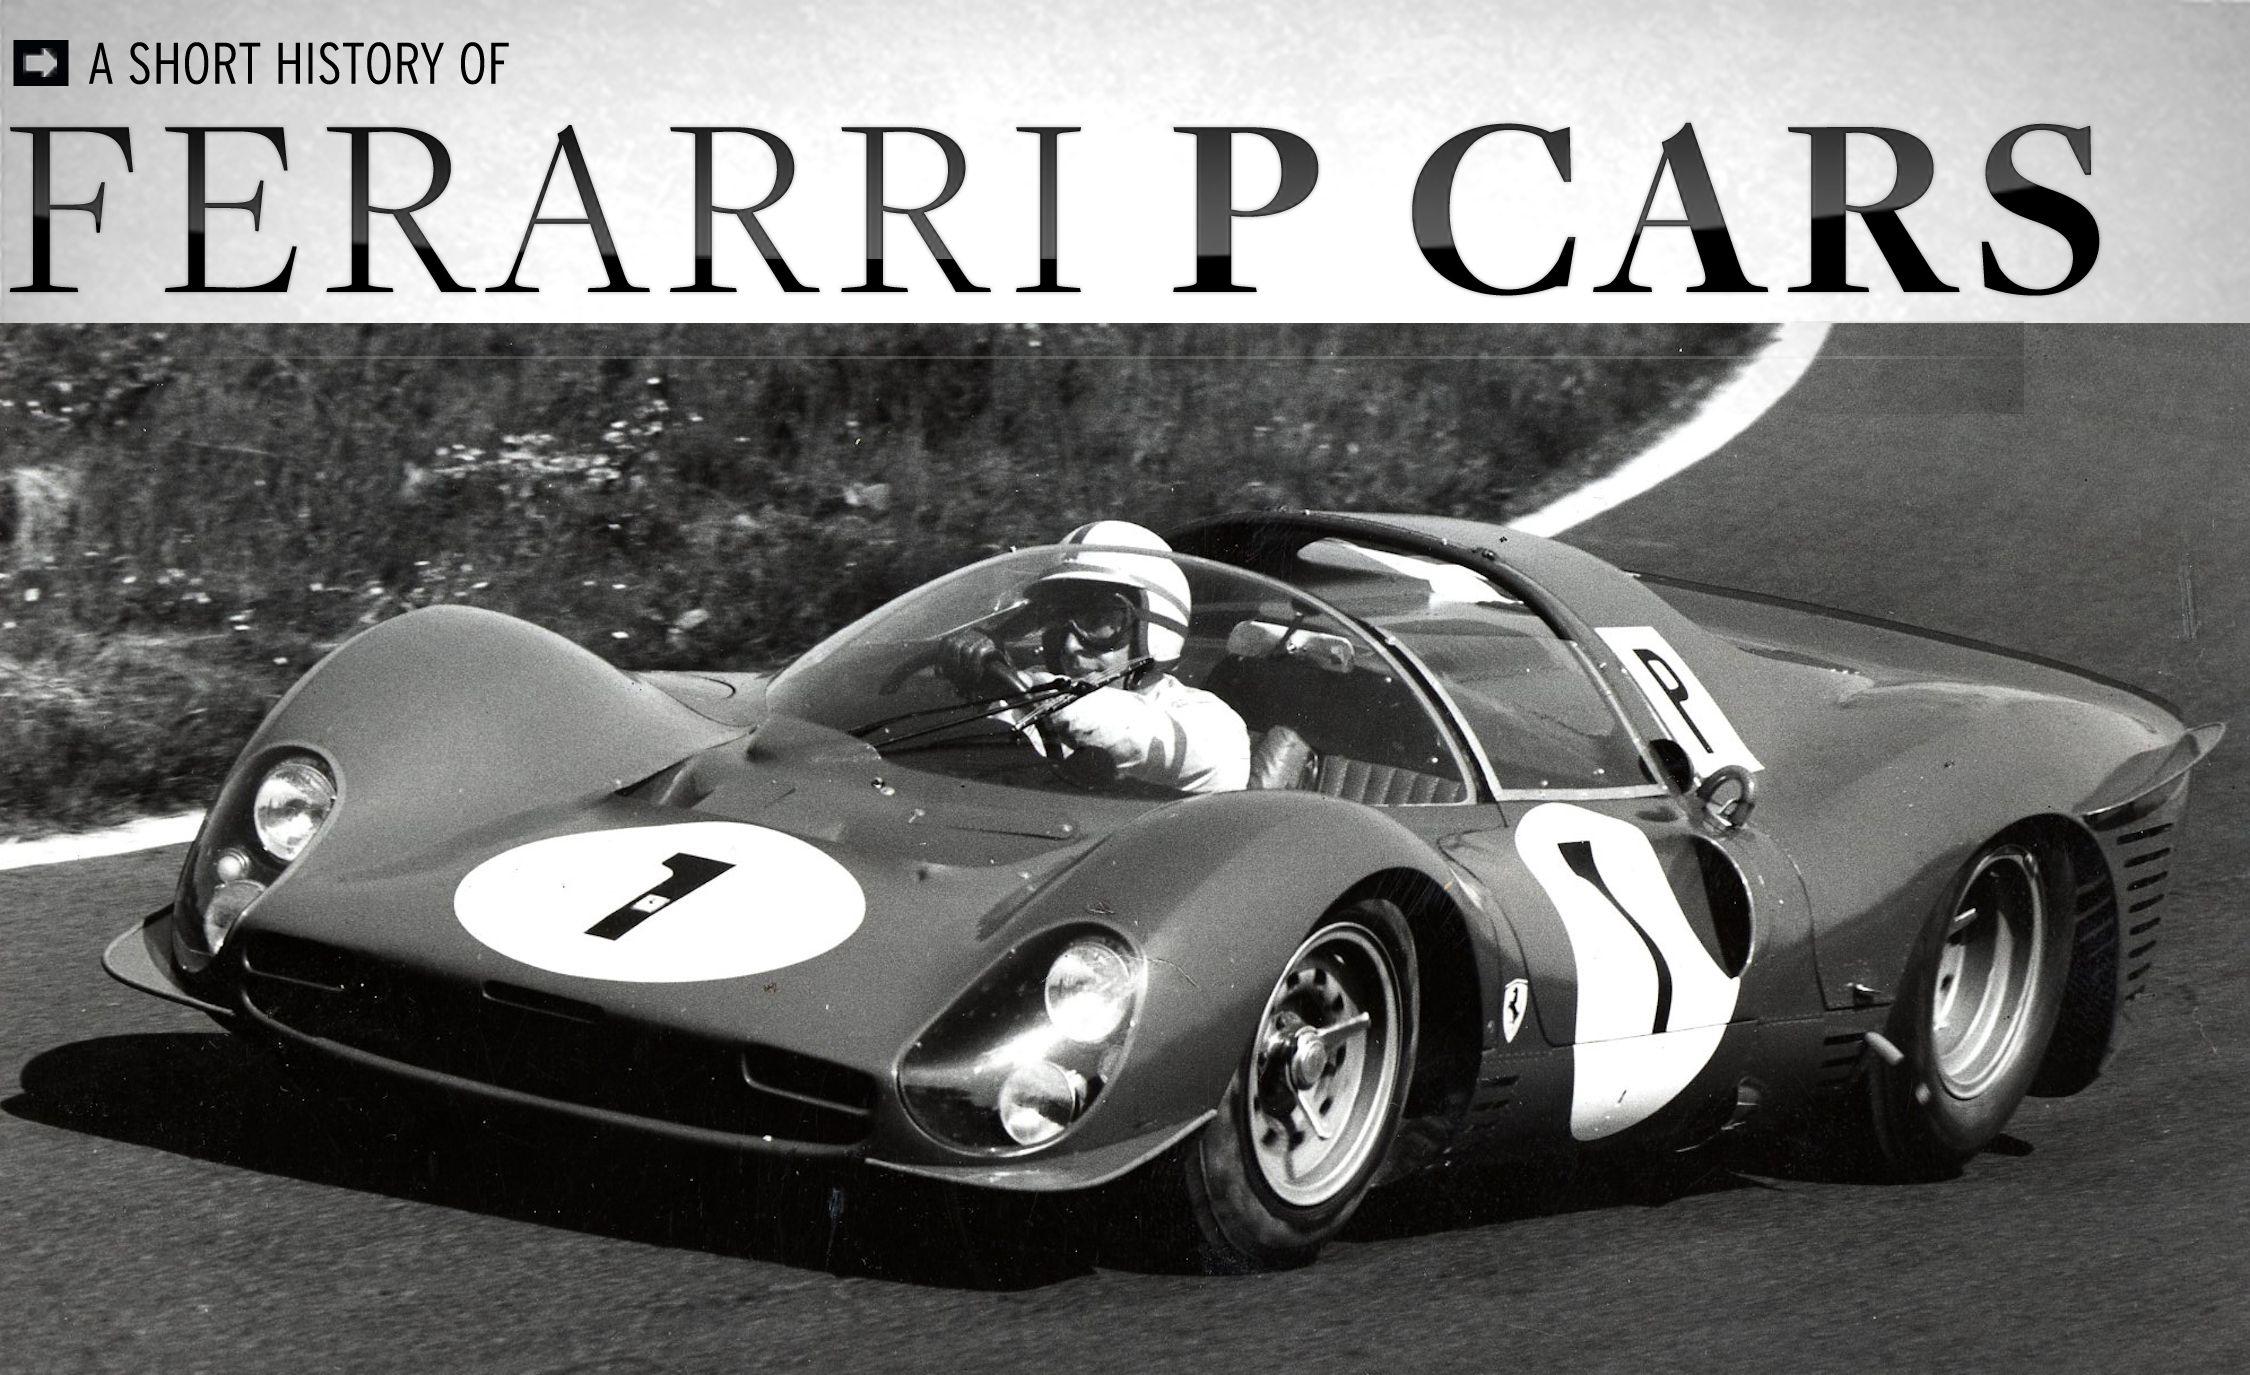 A Short History of Ferrari P Cars